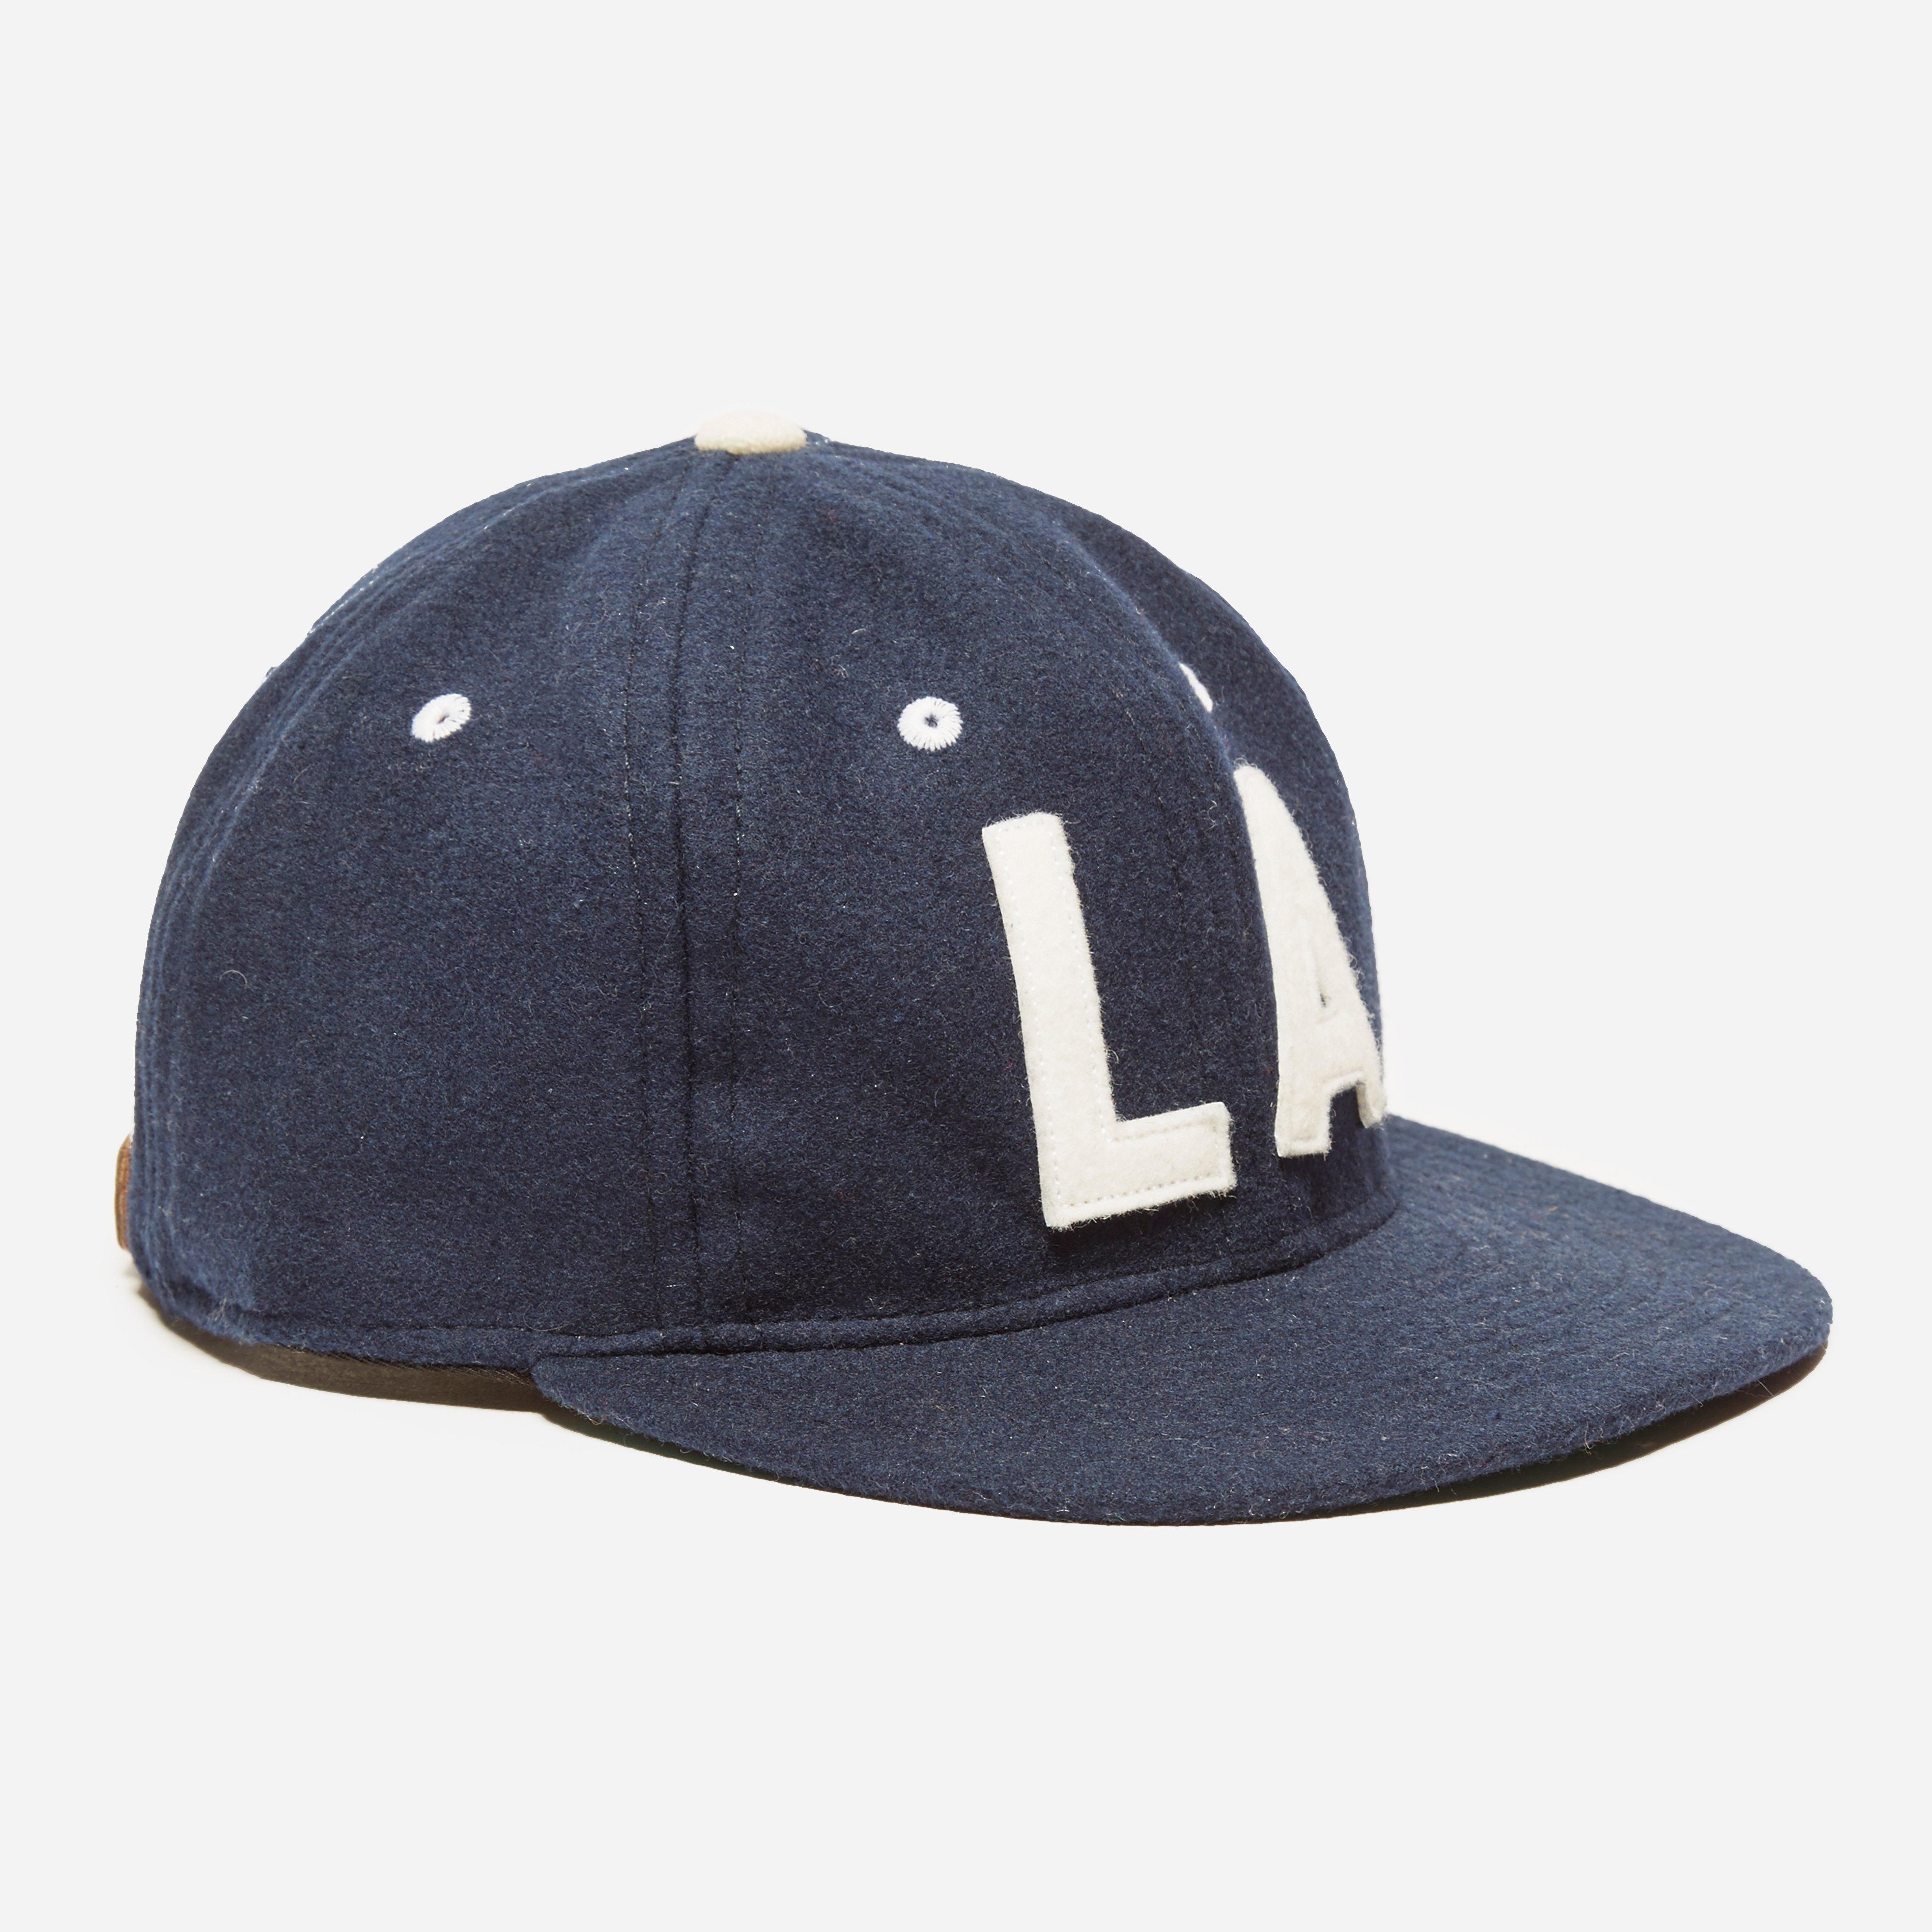 Ebbets Los Angeles Angels 1954 Cap Navy Wool